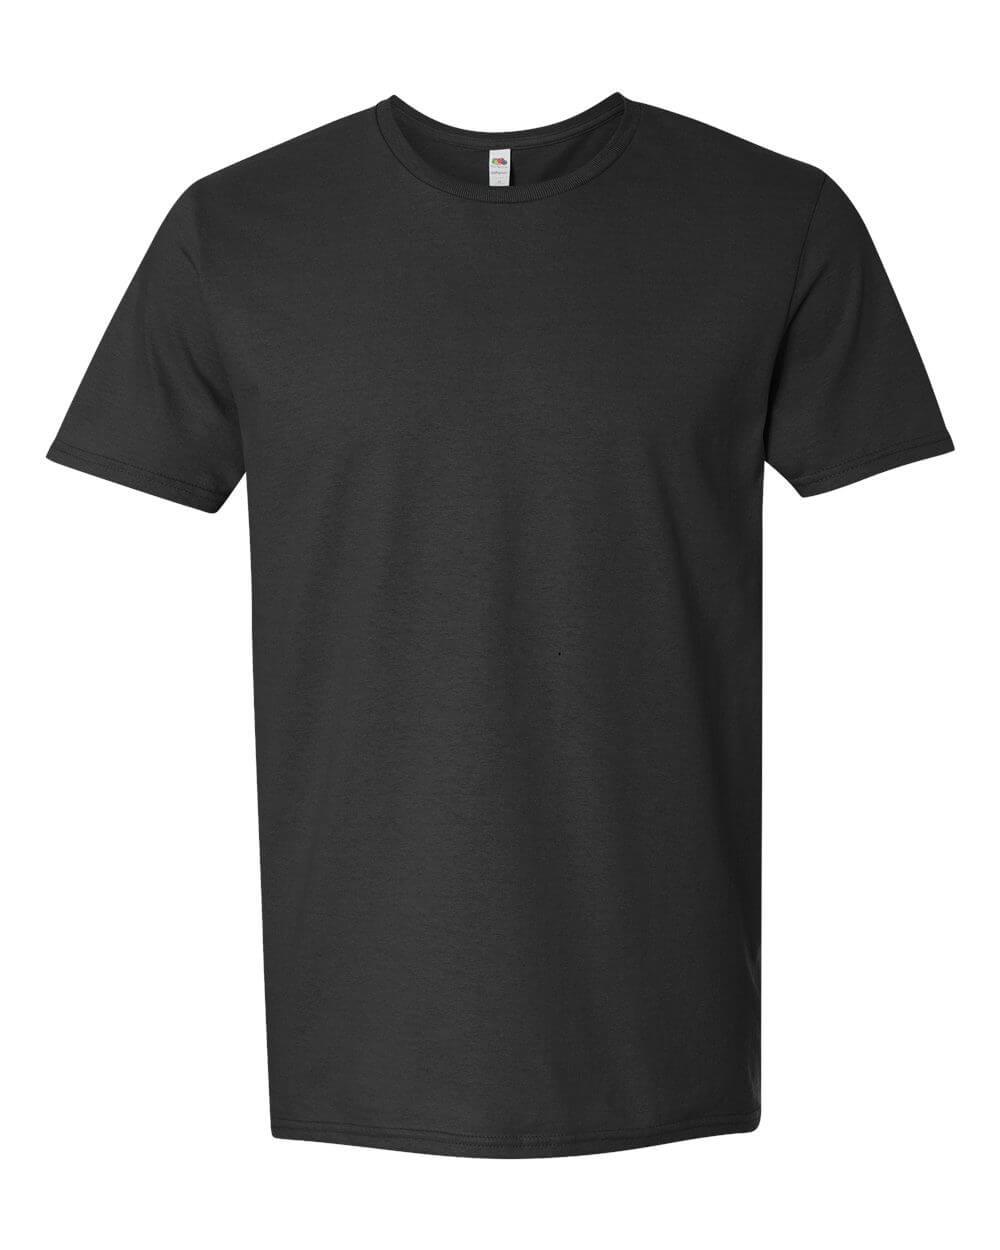 Fruit-of-the-Loom-Mens-Sofspun-Black-Custom-T-Shirts